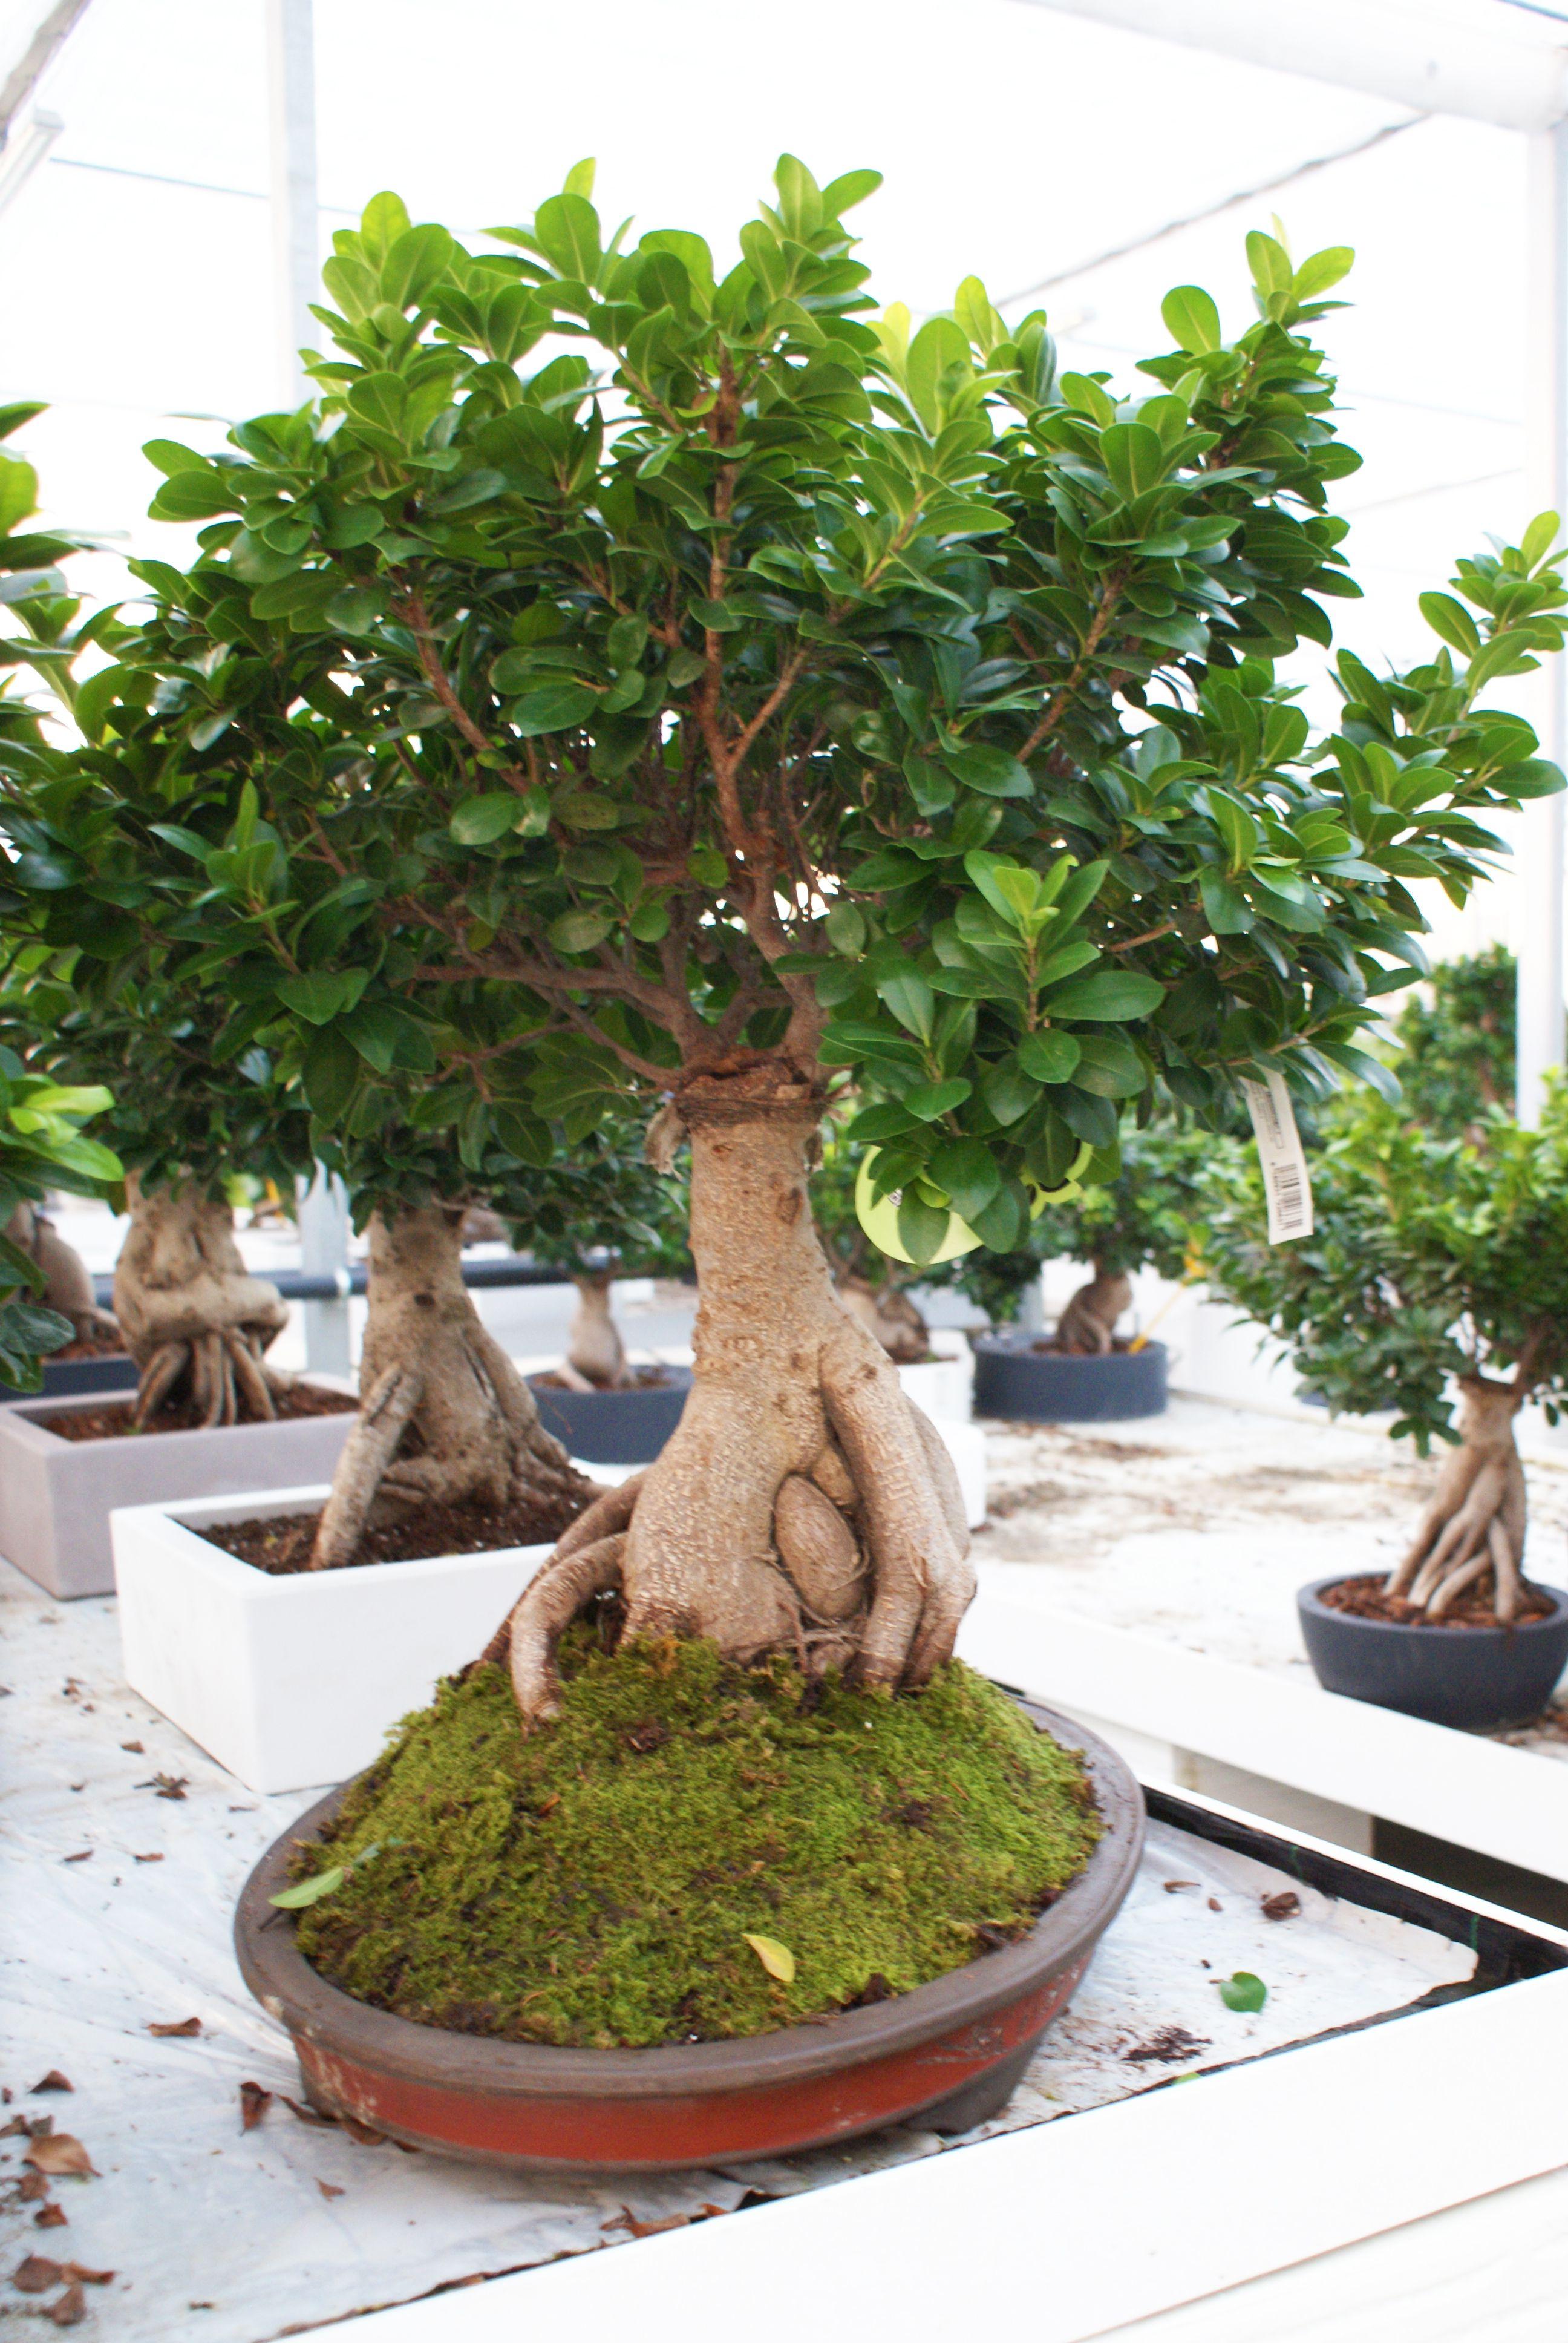 In Diretta Dallo Showroom Bonsai Ficus Ginseng 5000 Gr In Vaso